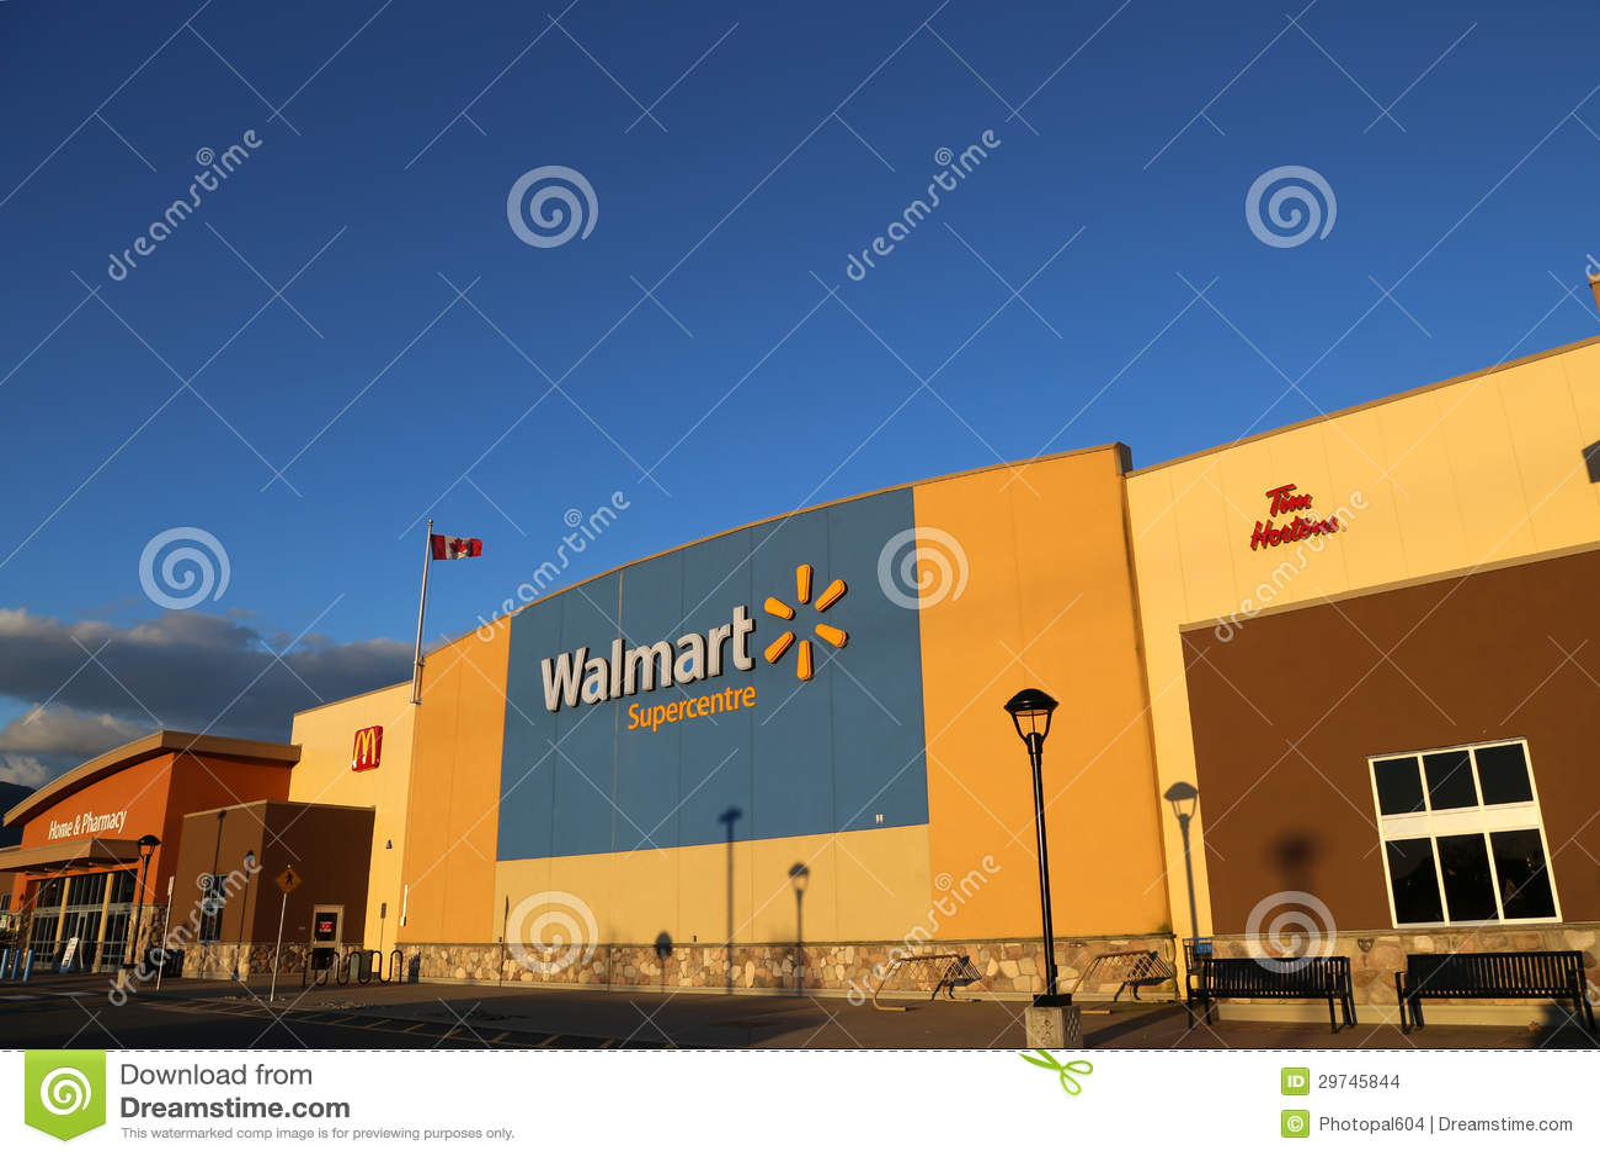 Exterior Shot Of A Walmart Store Editorial Stock Image